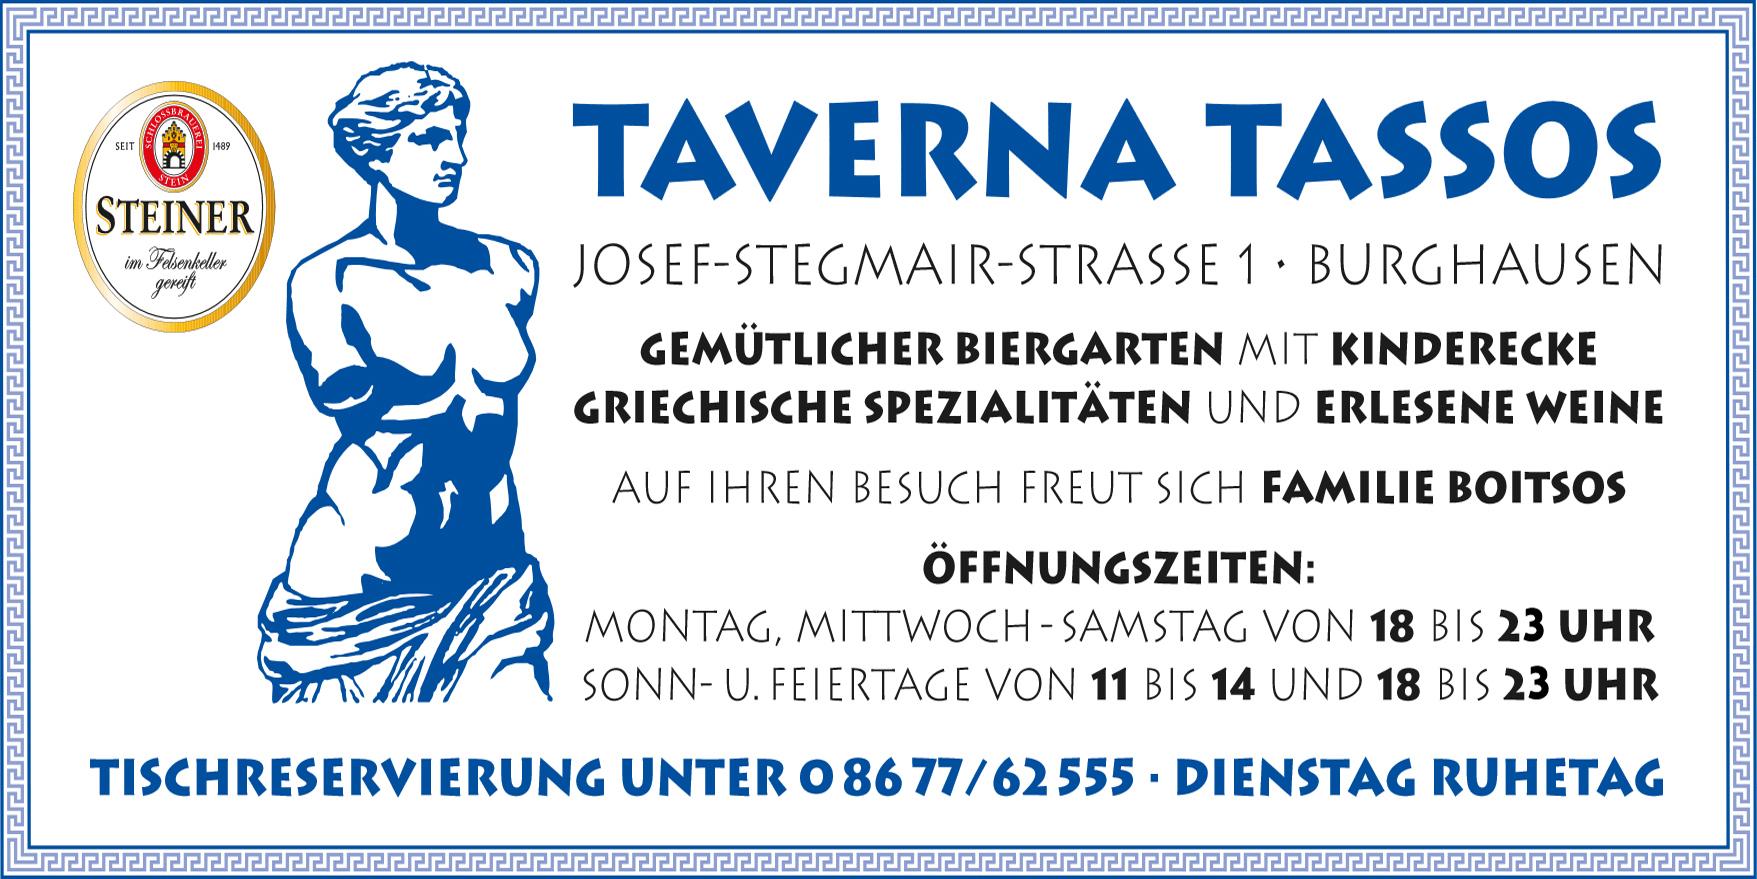 Taverna Tassos